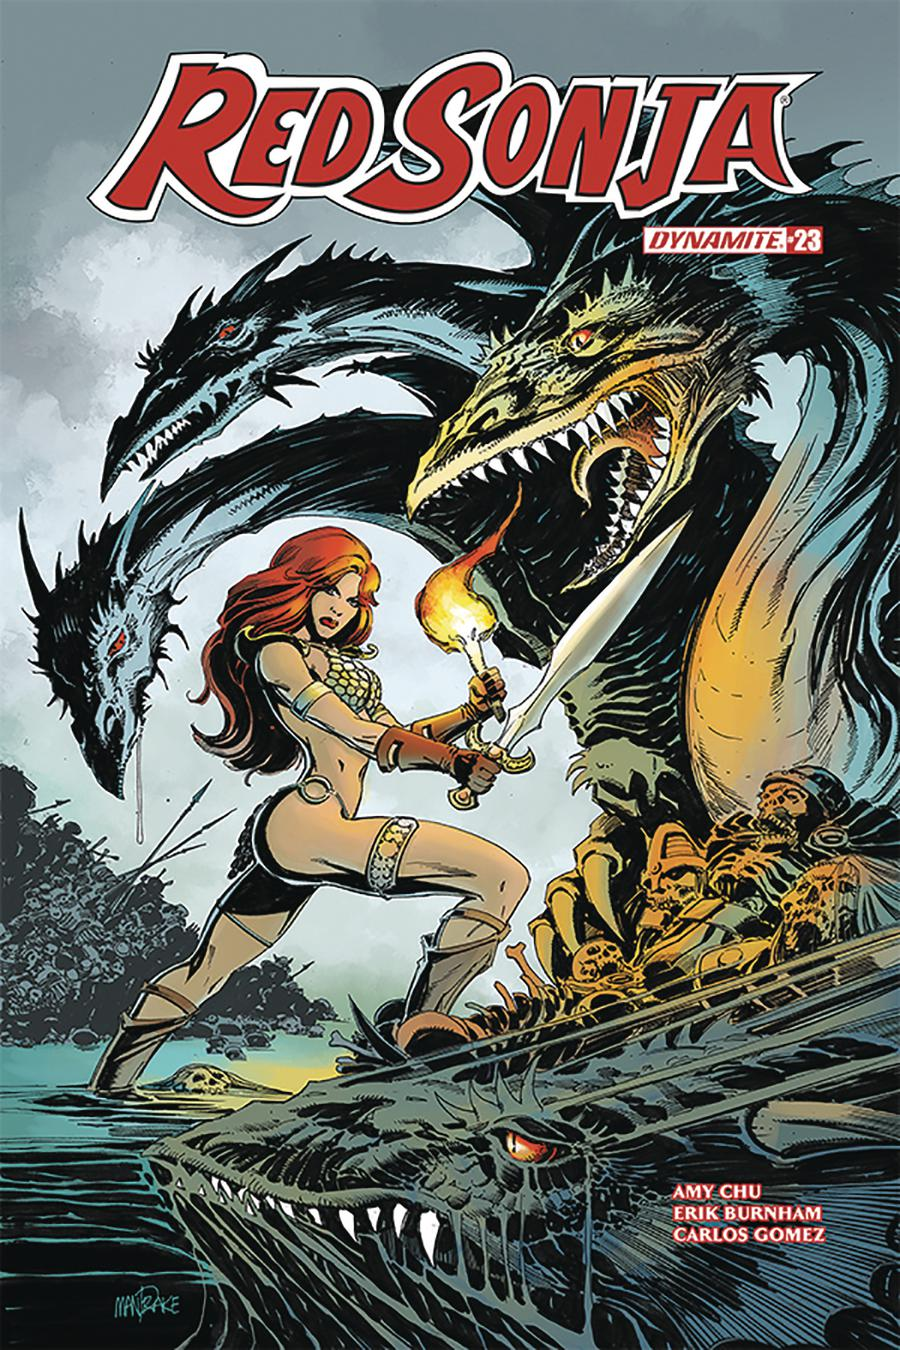 Red Sonja Vol 7 #23 Cover C Variant Tom Mandrake Cover